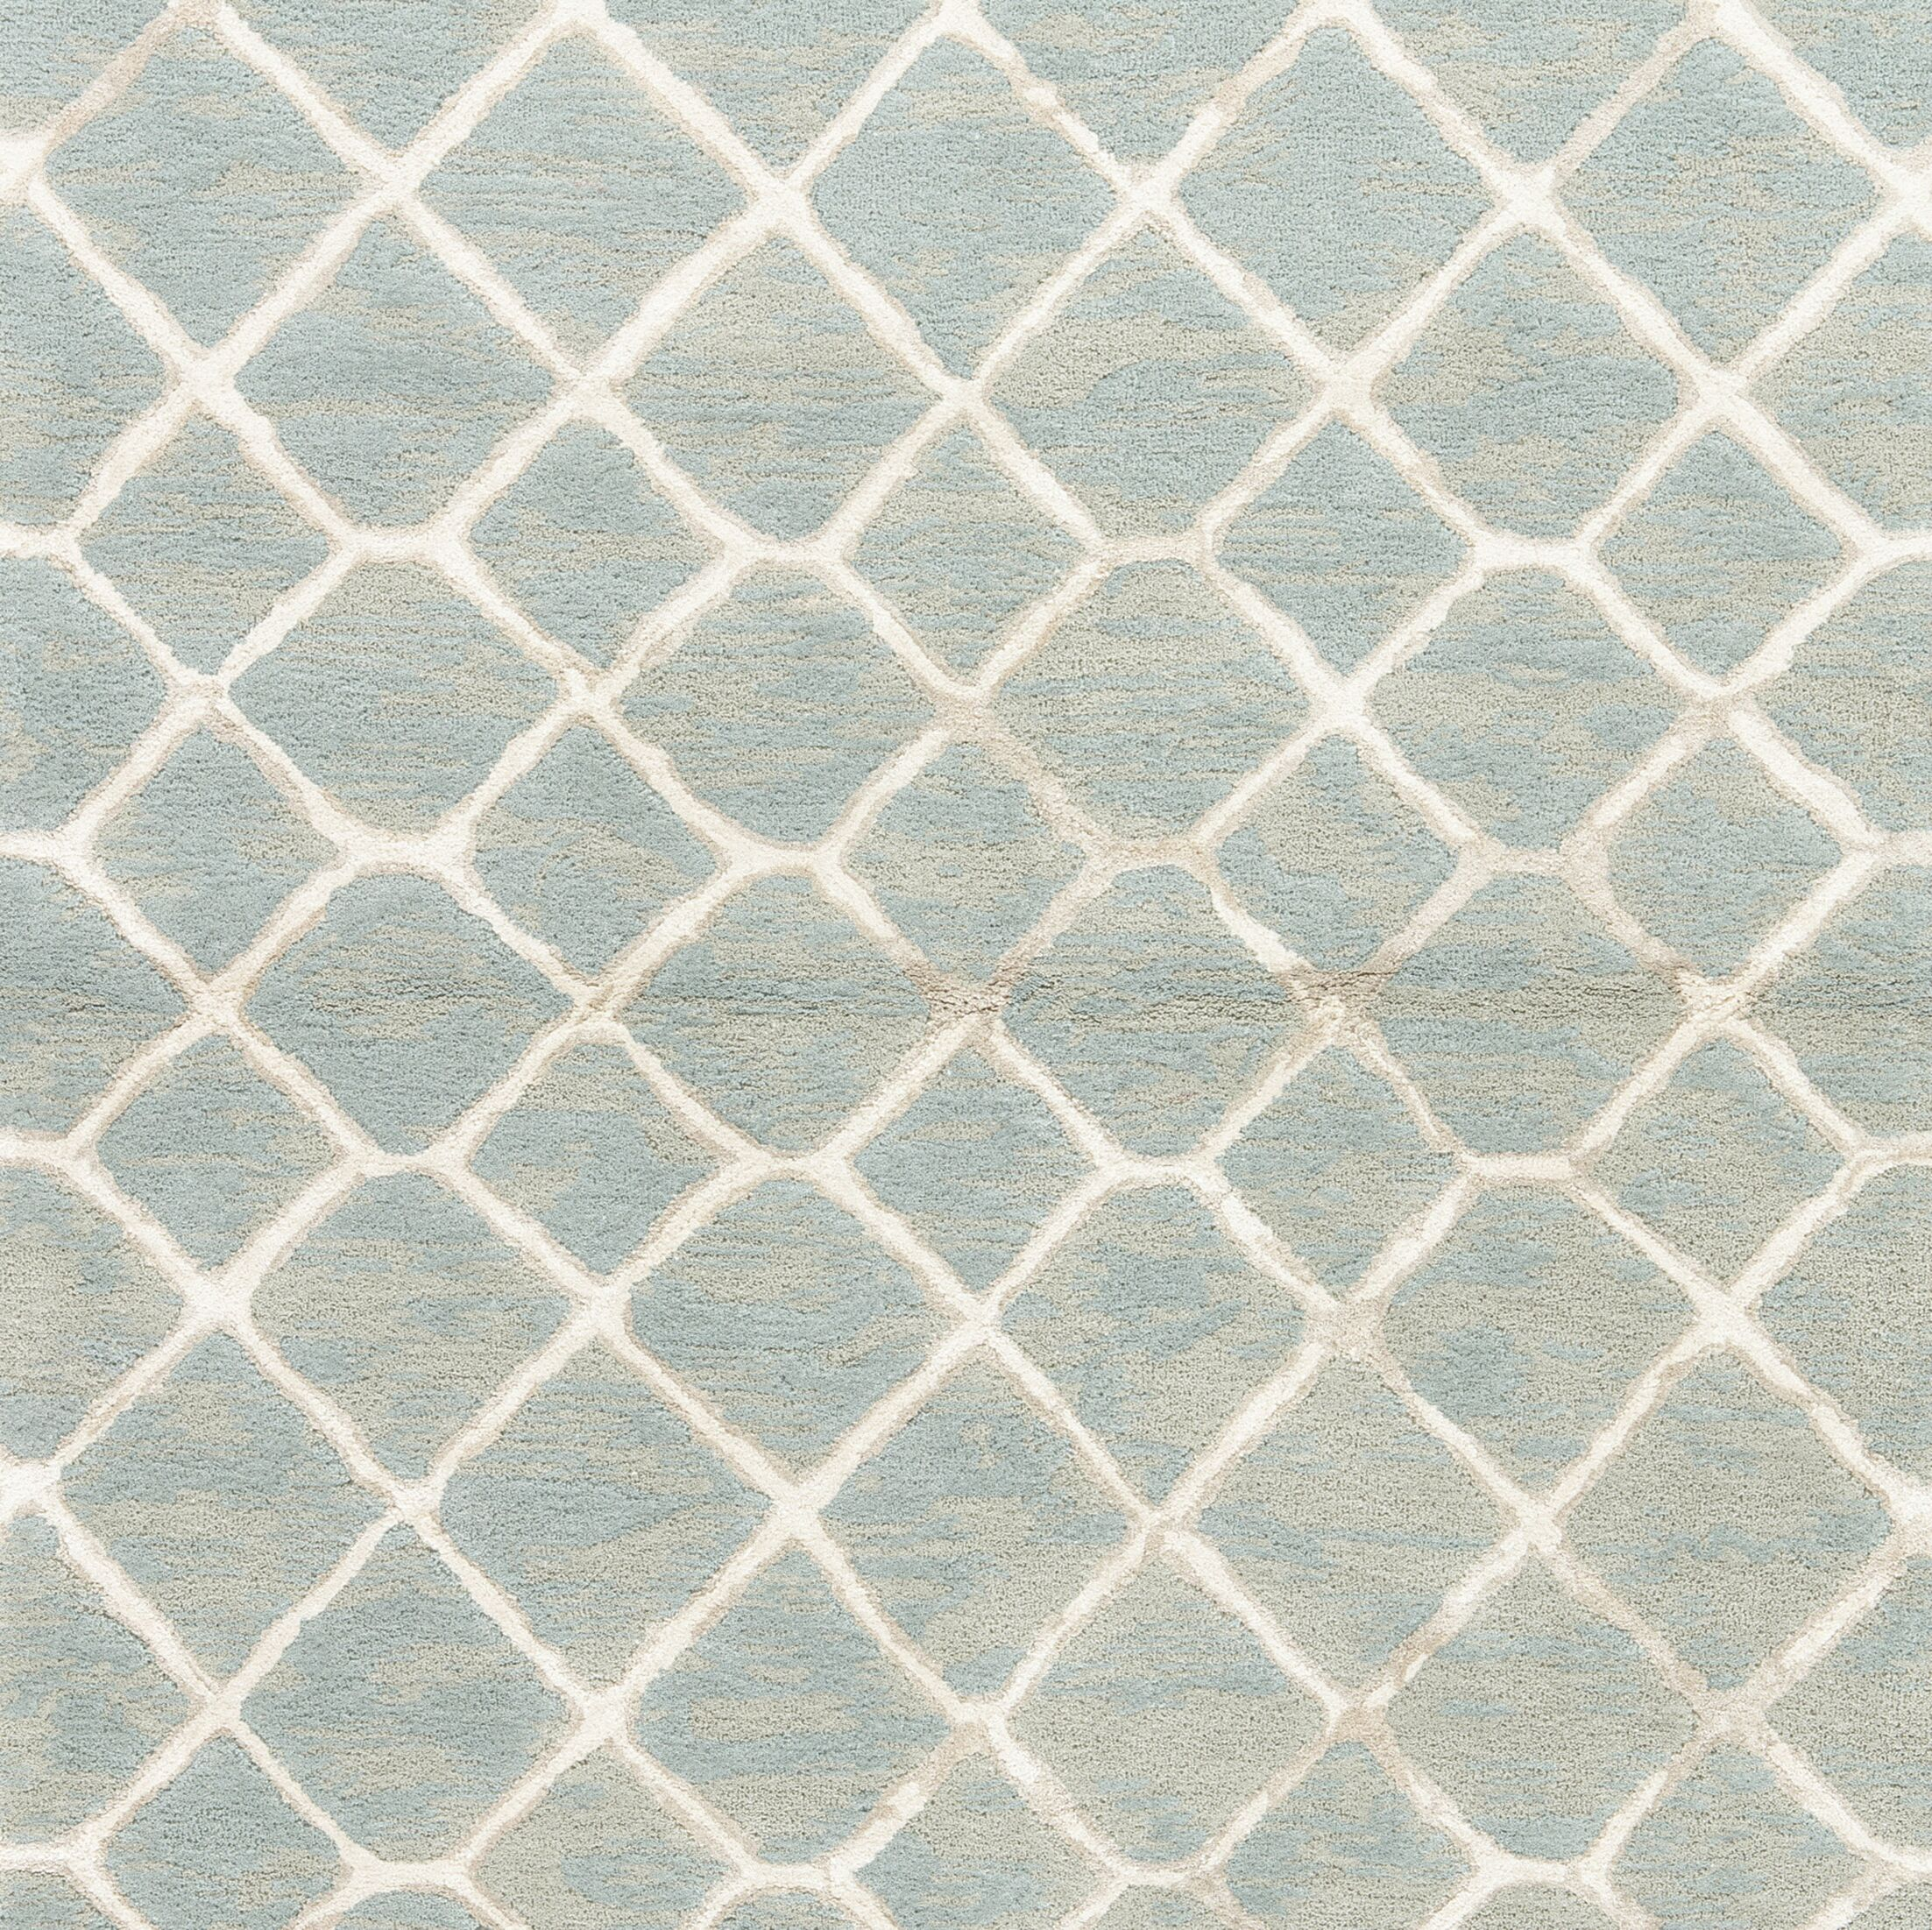 Heldt Hand-Tufted Blue/Cream/Tan Area Rug Rug Size: Rectangle 5' x 8'